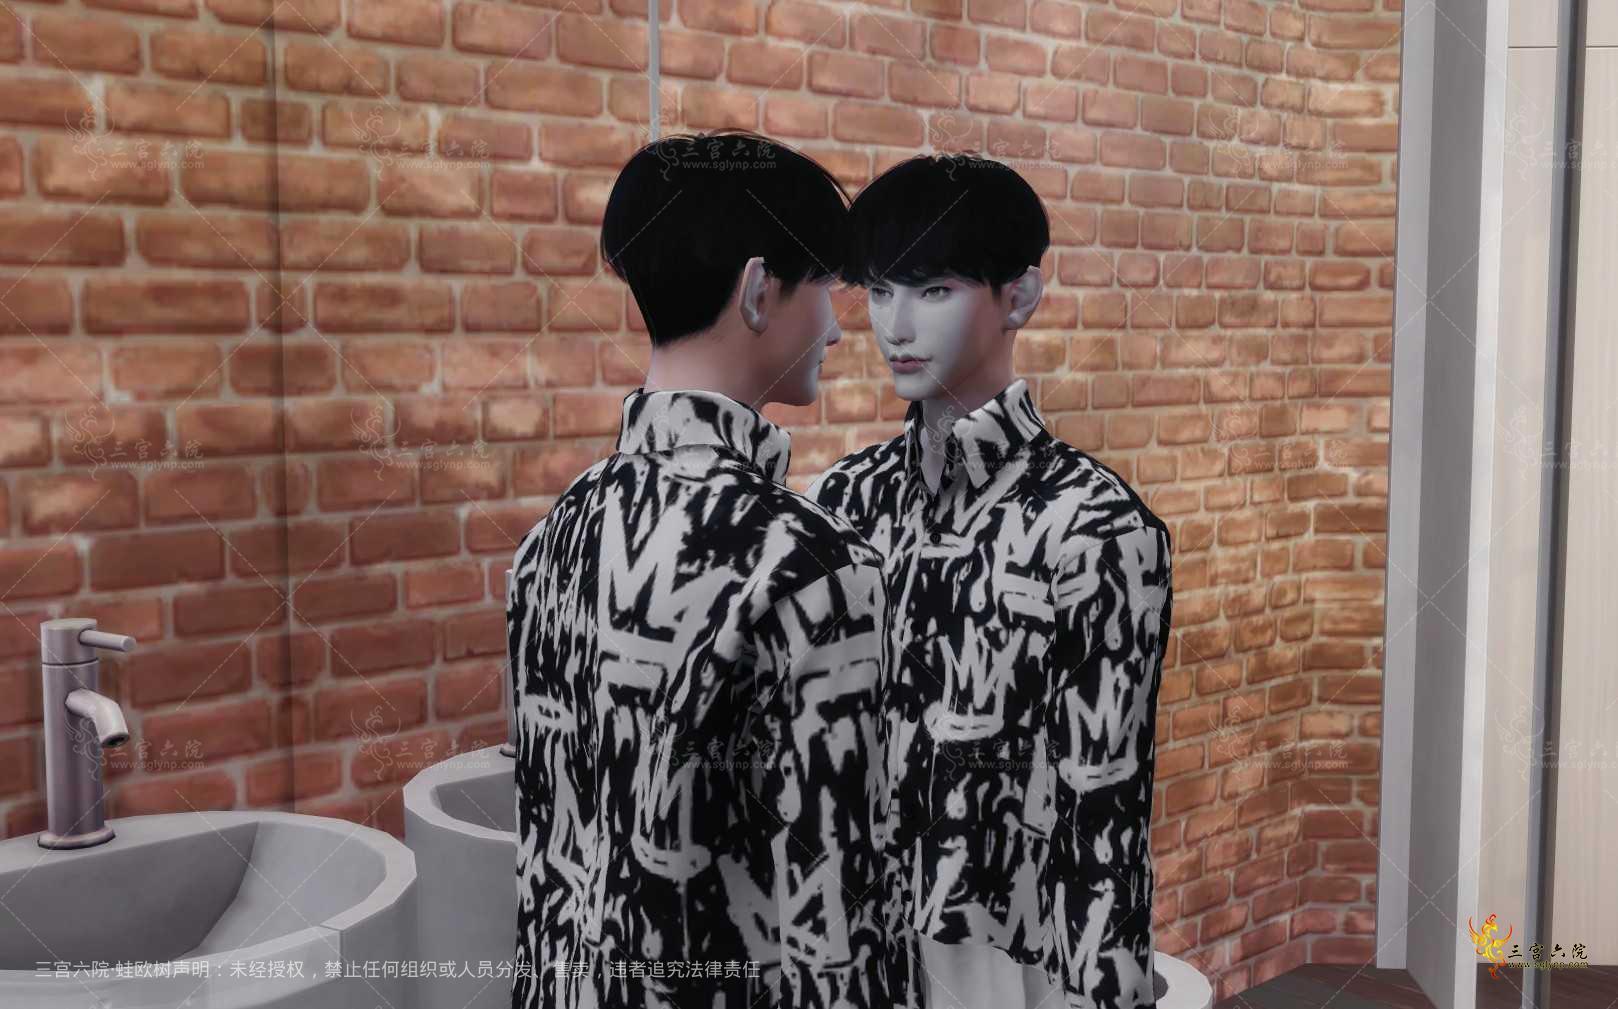 The Sims鈩